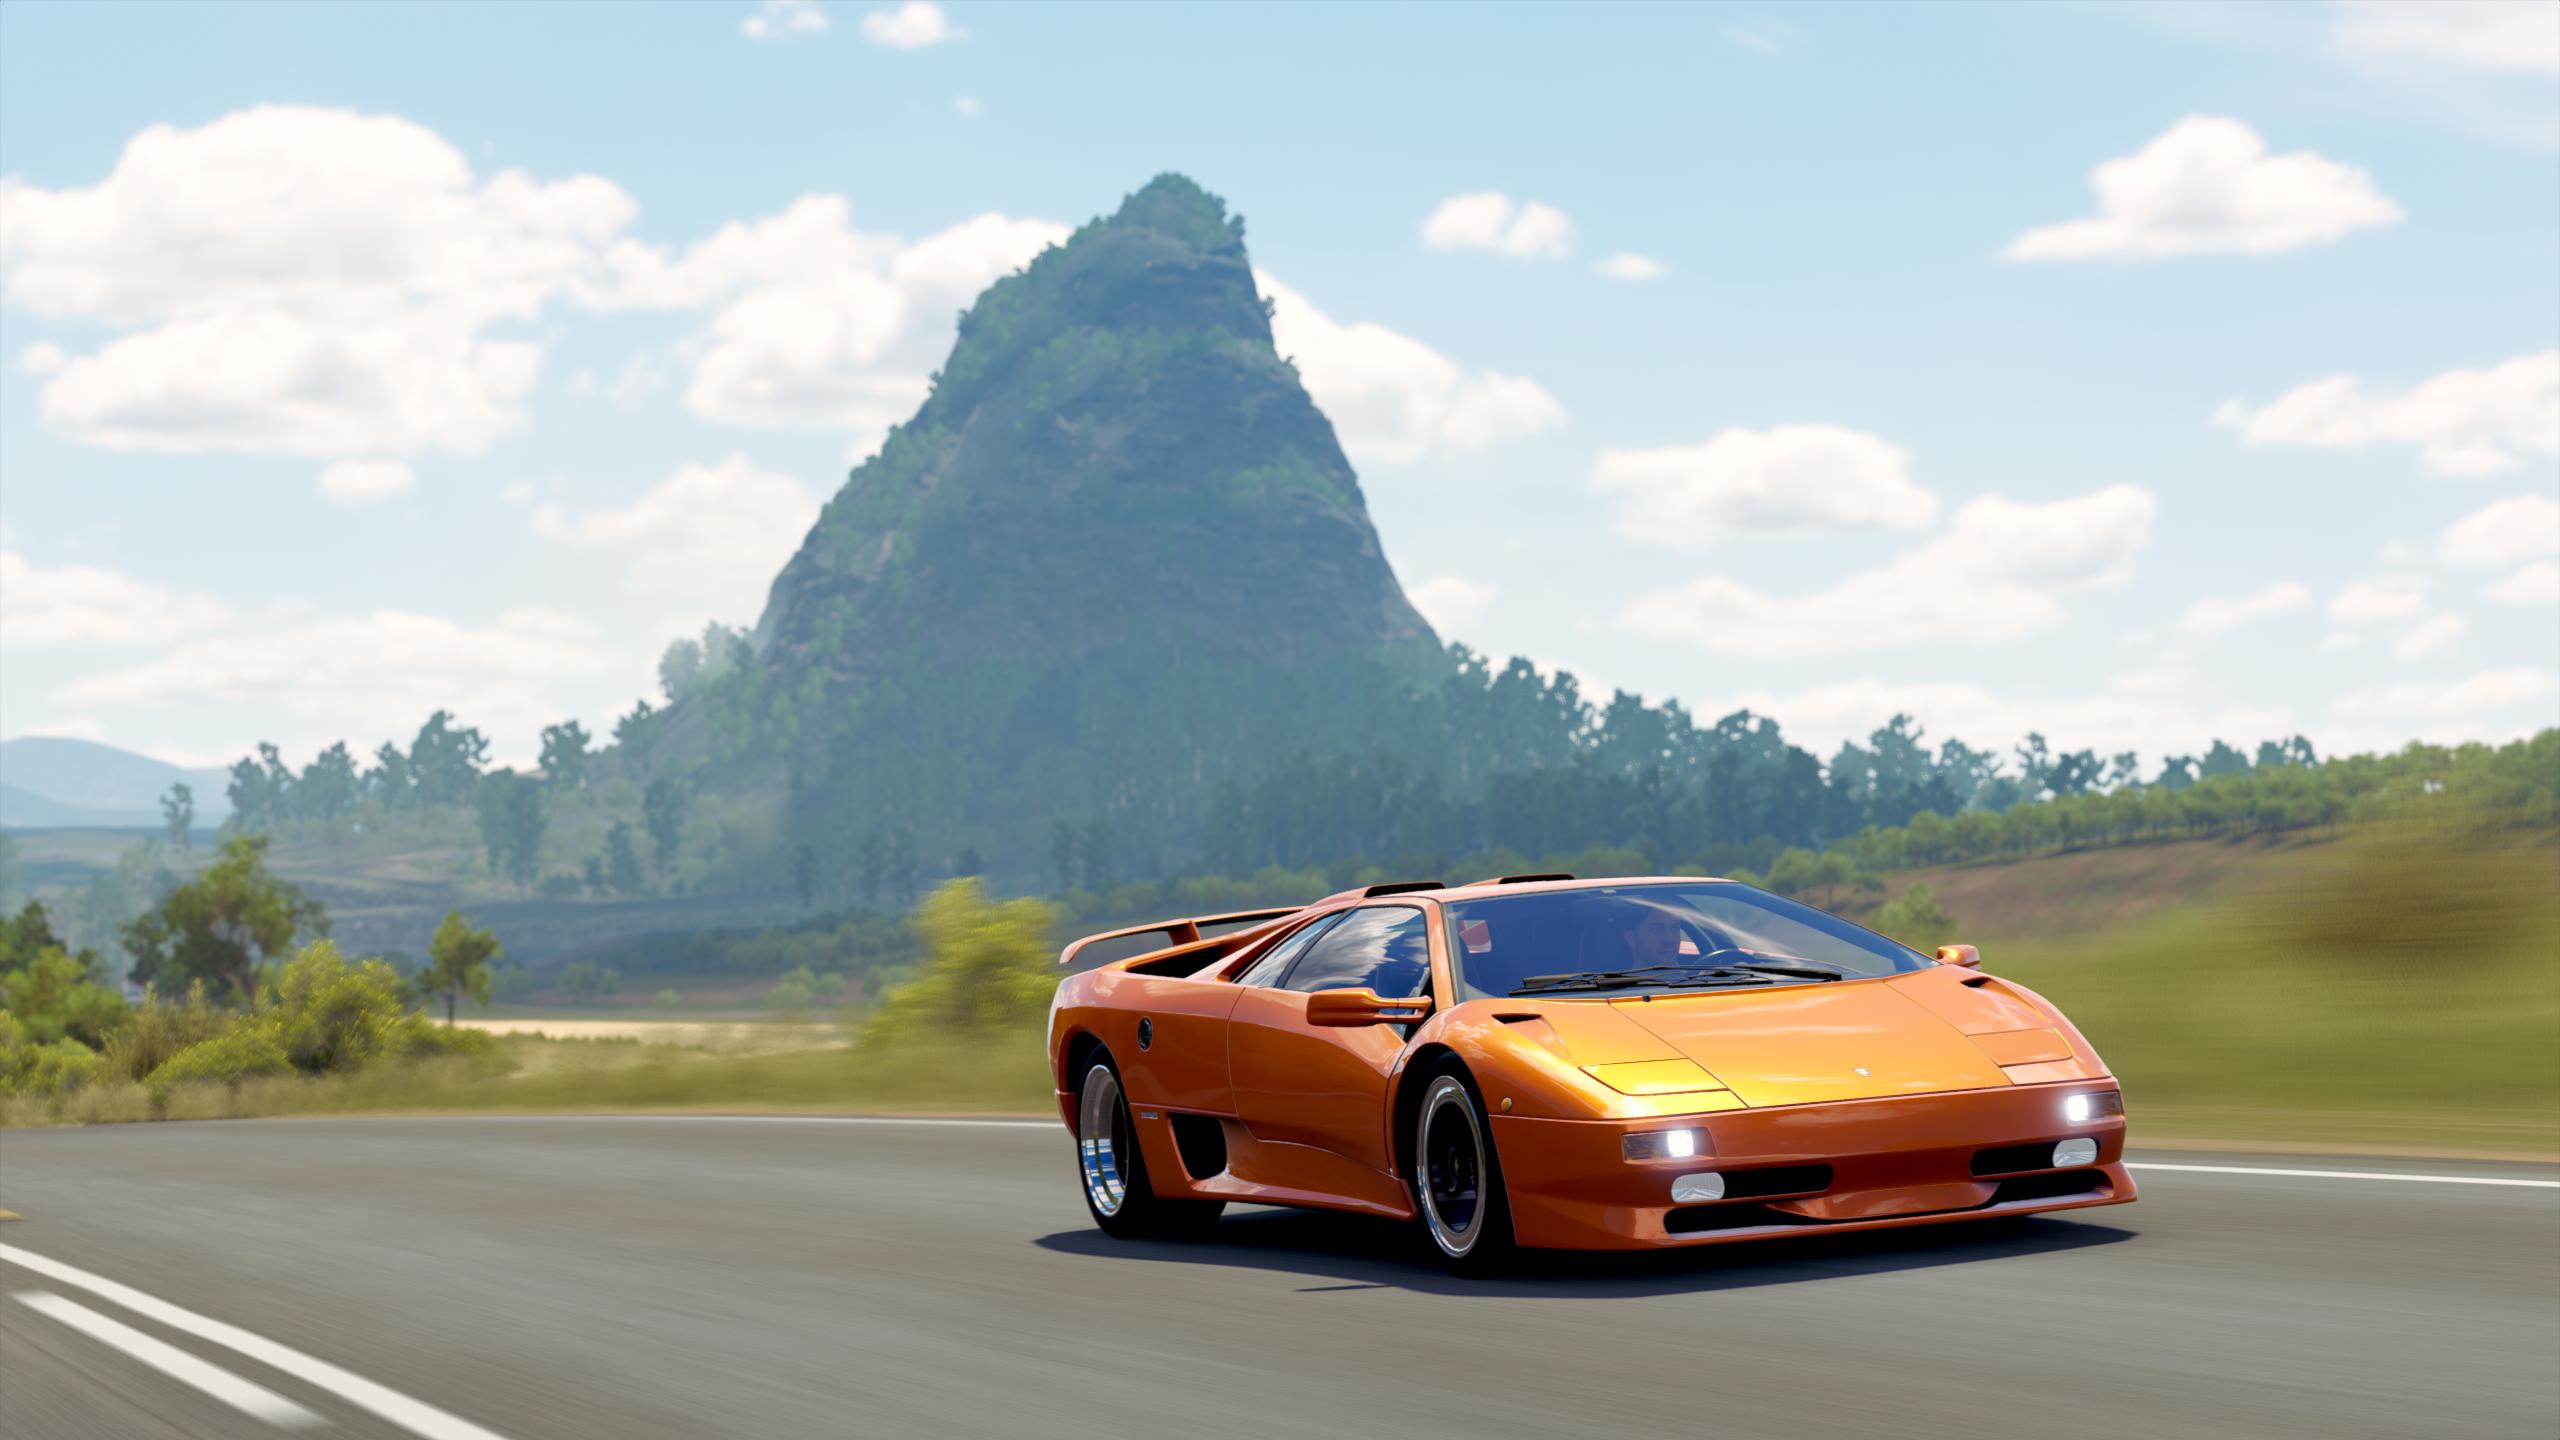 Forza Horizon 3 Car 2k Lamborghini Diablo Sv Video Games